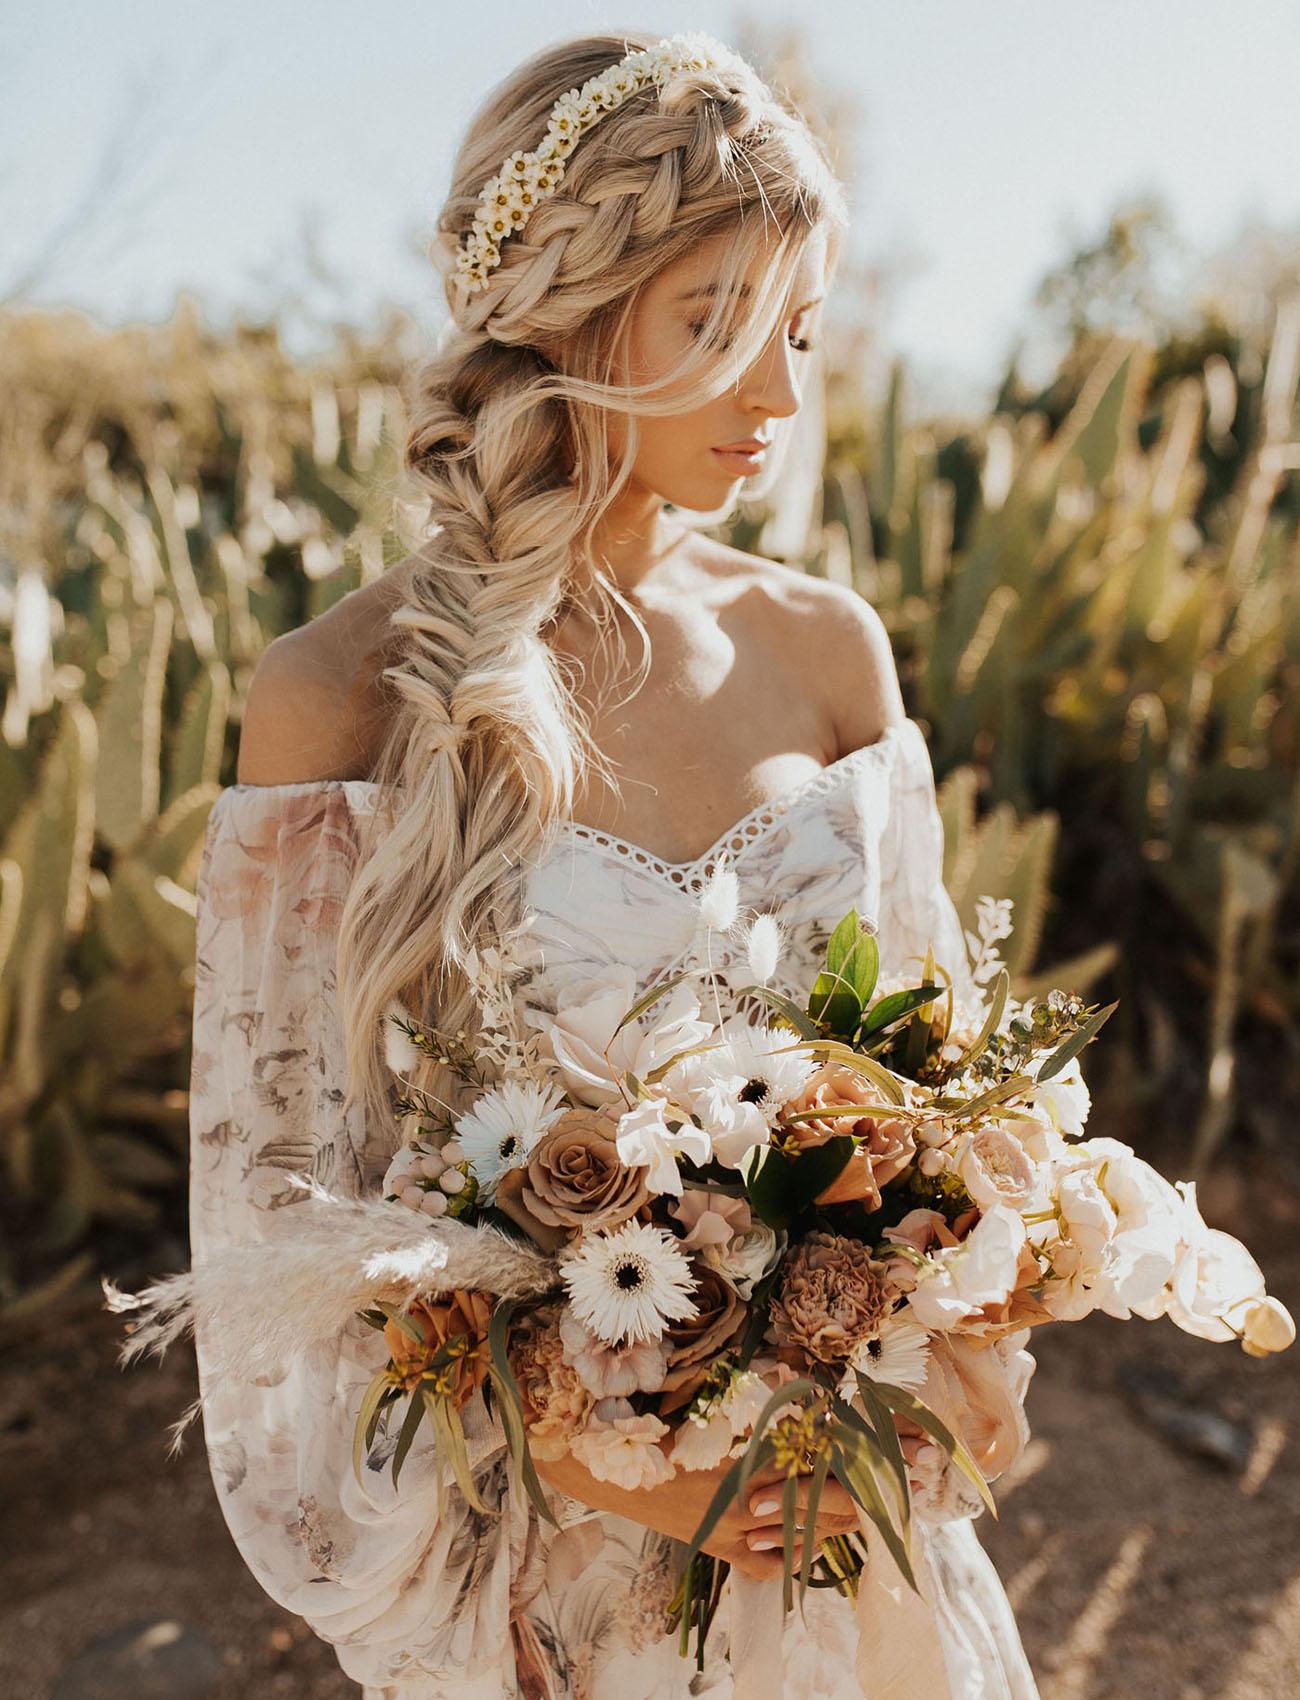 Bohemian bruid met bloemen